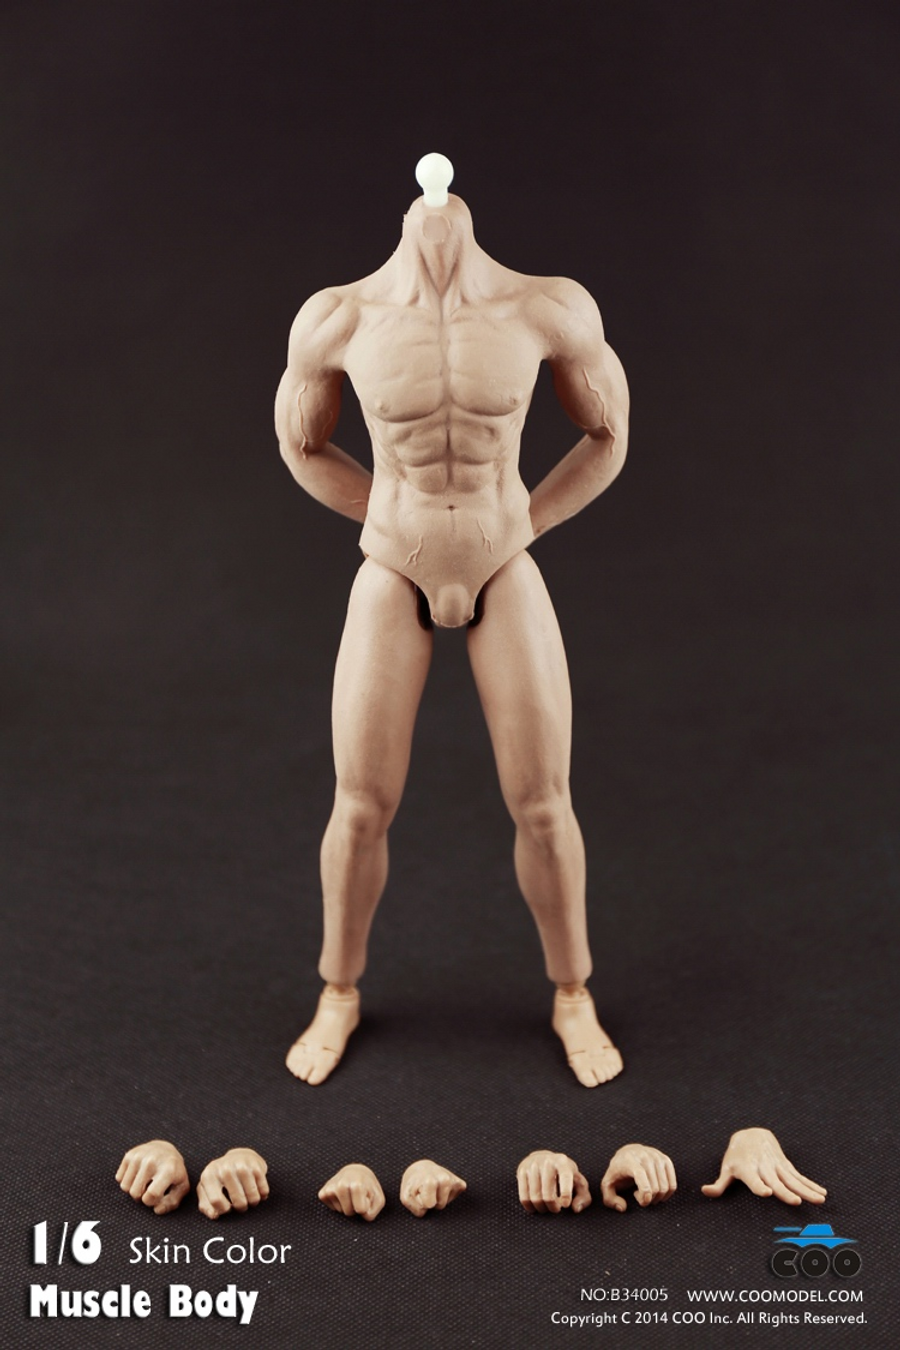 COO Model - Rubber Muscular Male Body CM-B34005